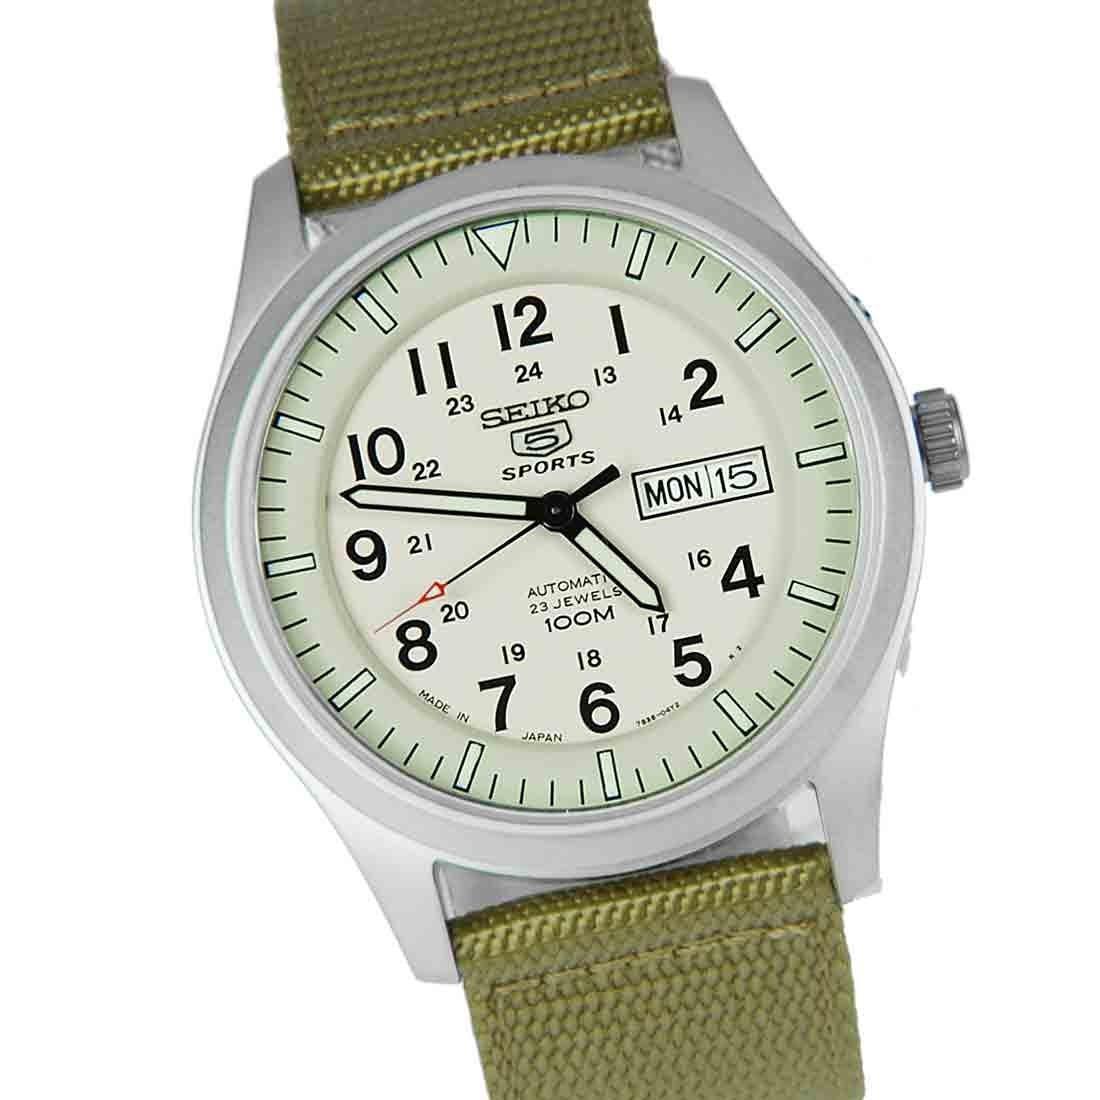 Часы Seiko 5 Military SNZG07J1 Automatic 7S36